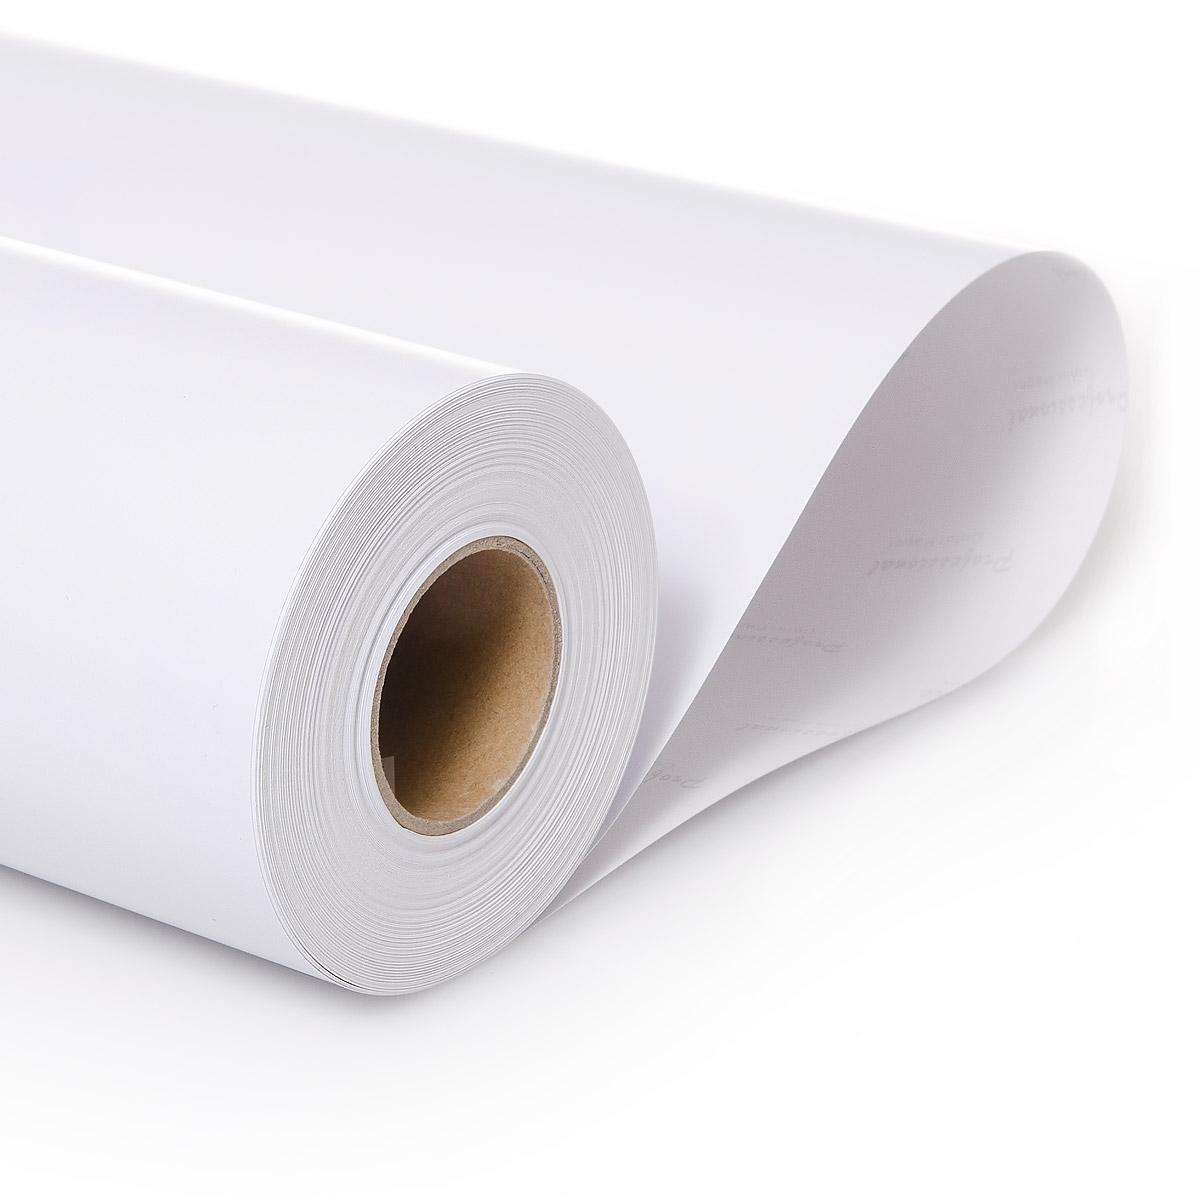 1 Rolle Inkjet RC Fotopapier | PREMIUM | Pearl | 260P | 43,2 cm x 30 m